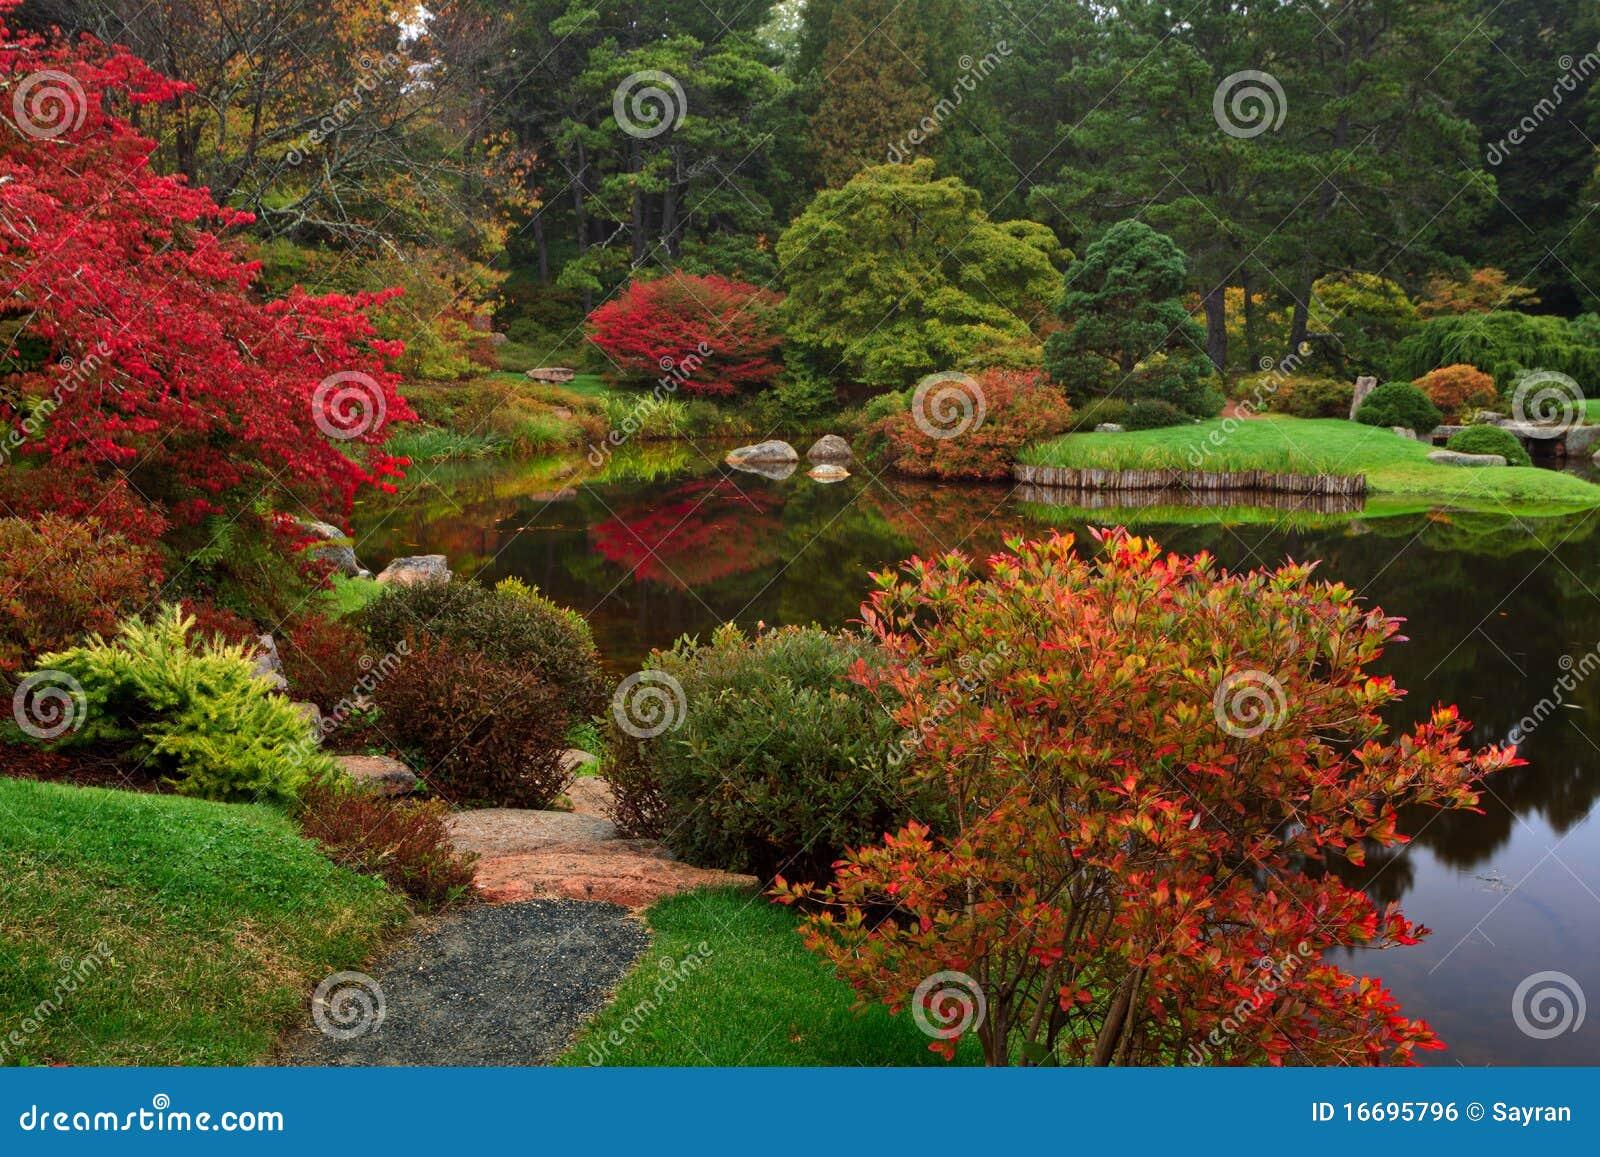 Asticou Azalea Garden stock photo. Image of hole, colorful - 16695796